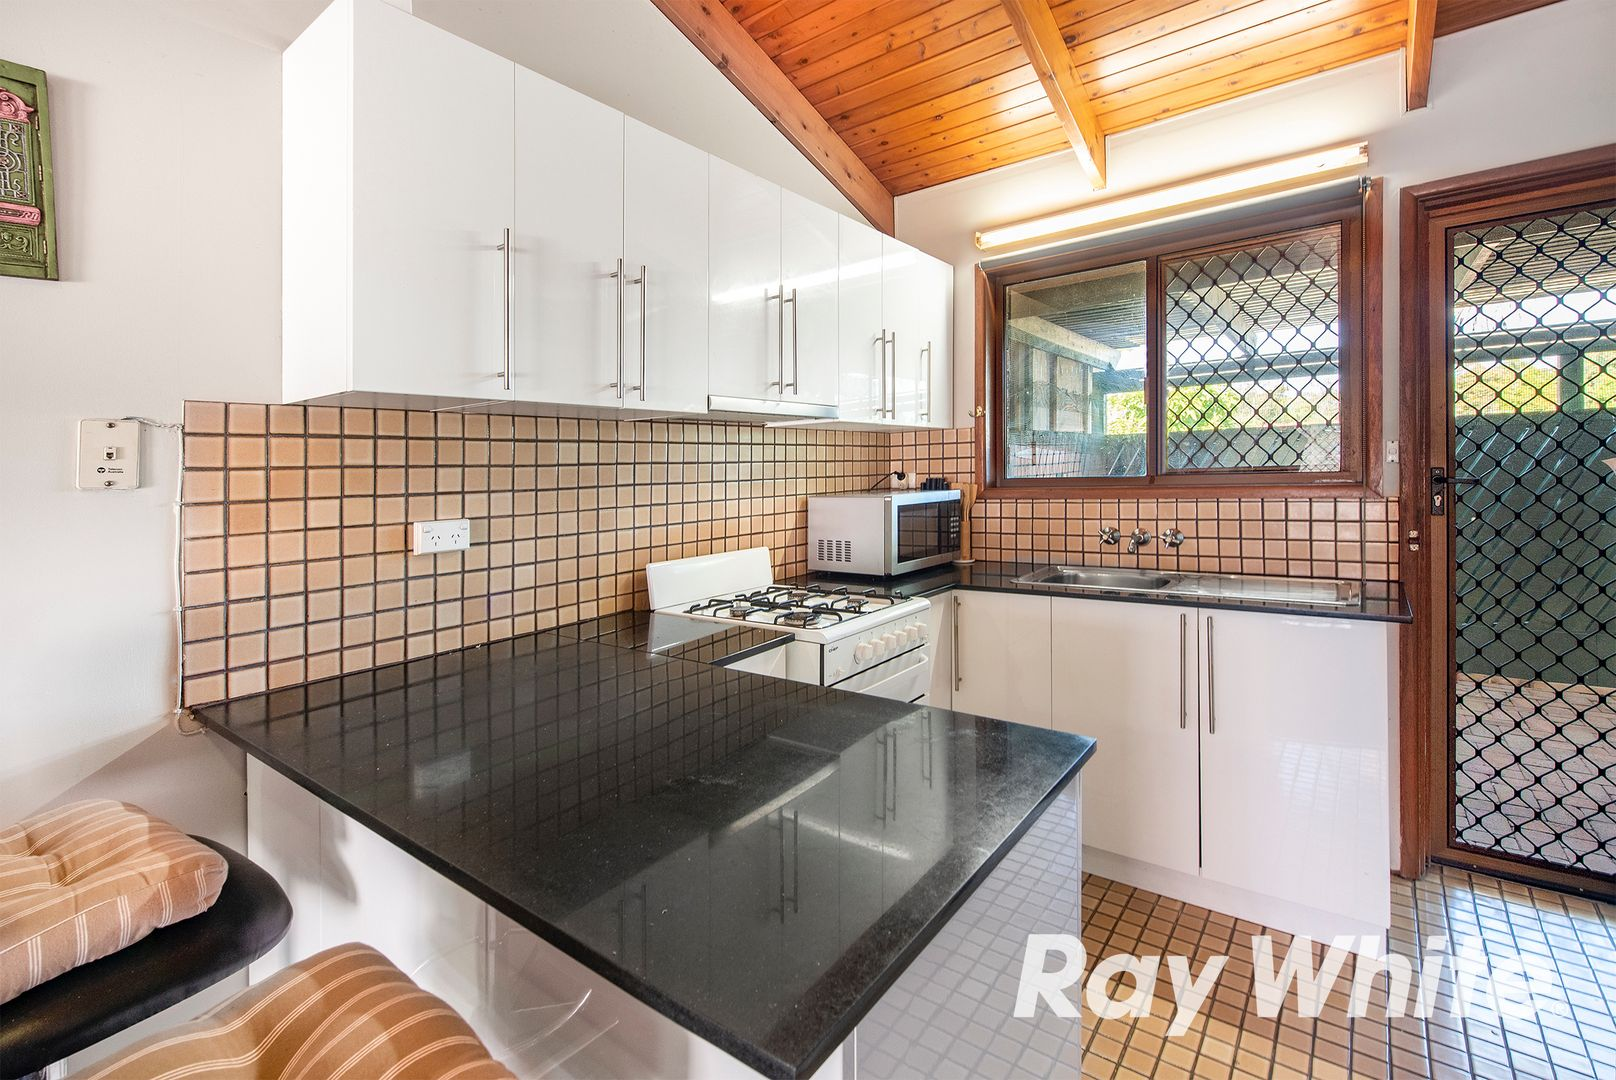 9/7 Marlow Street, Woodridge QLD 4114, Image 2